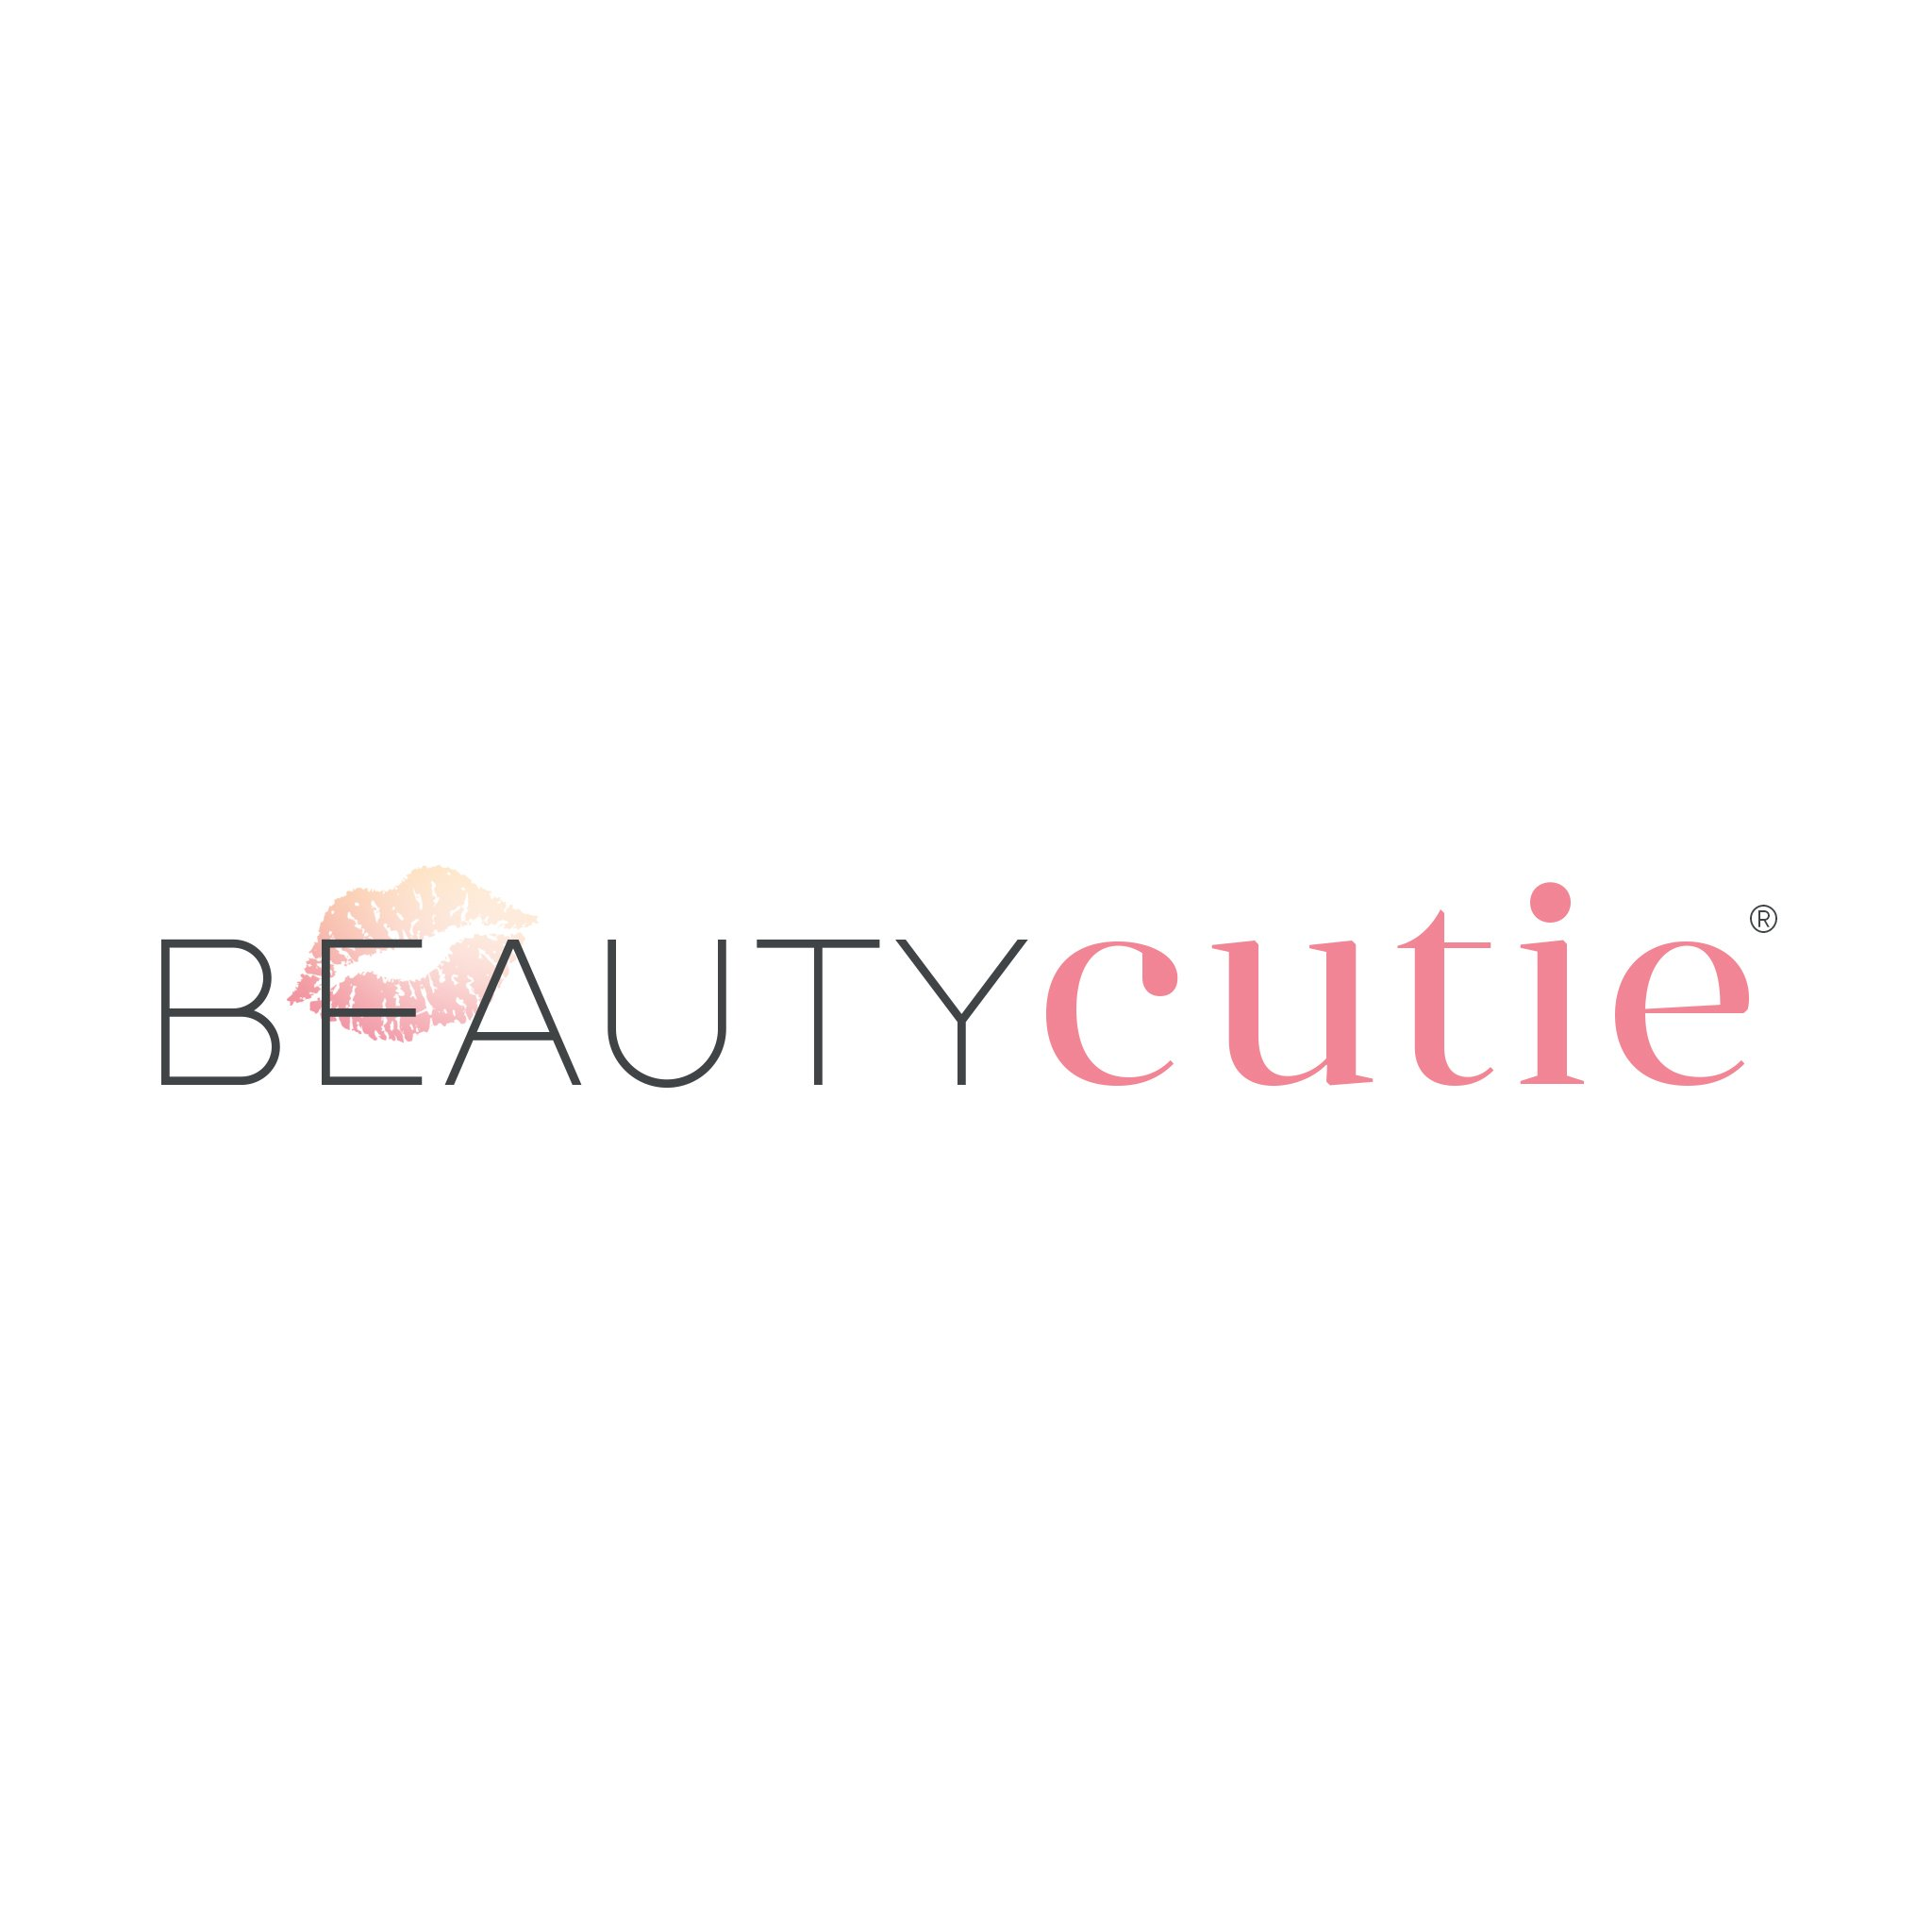 BeautyCutie.com